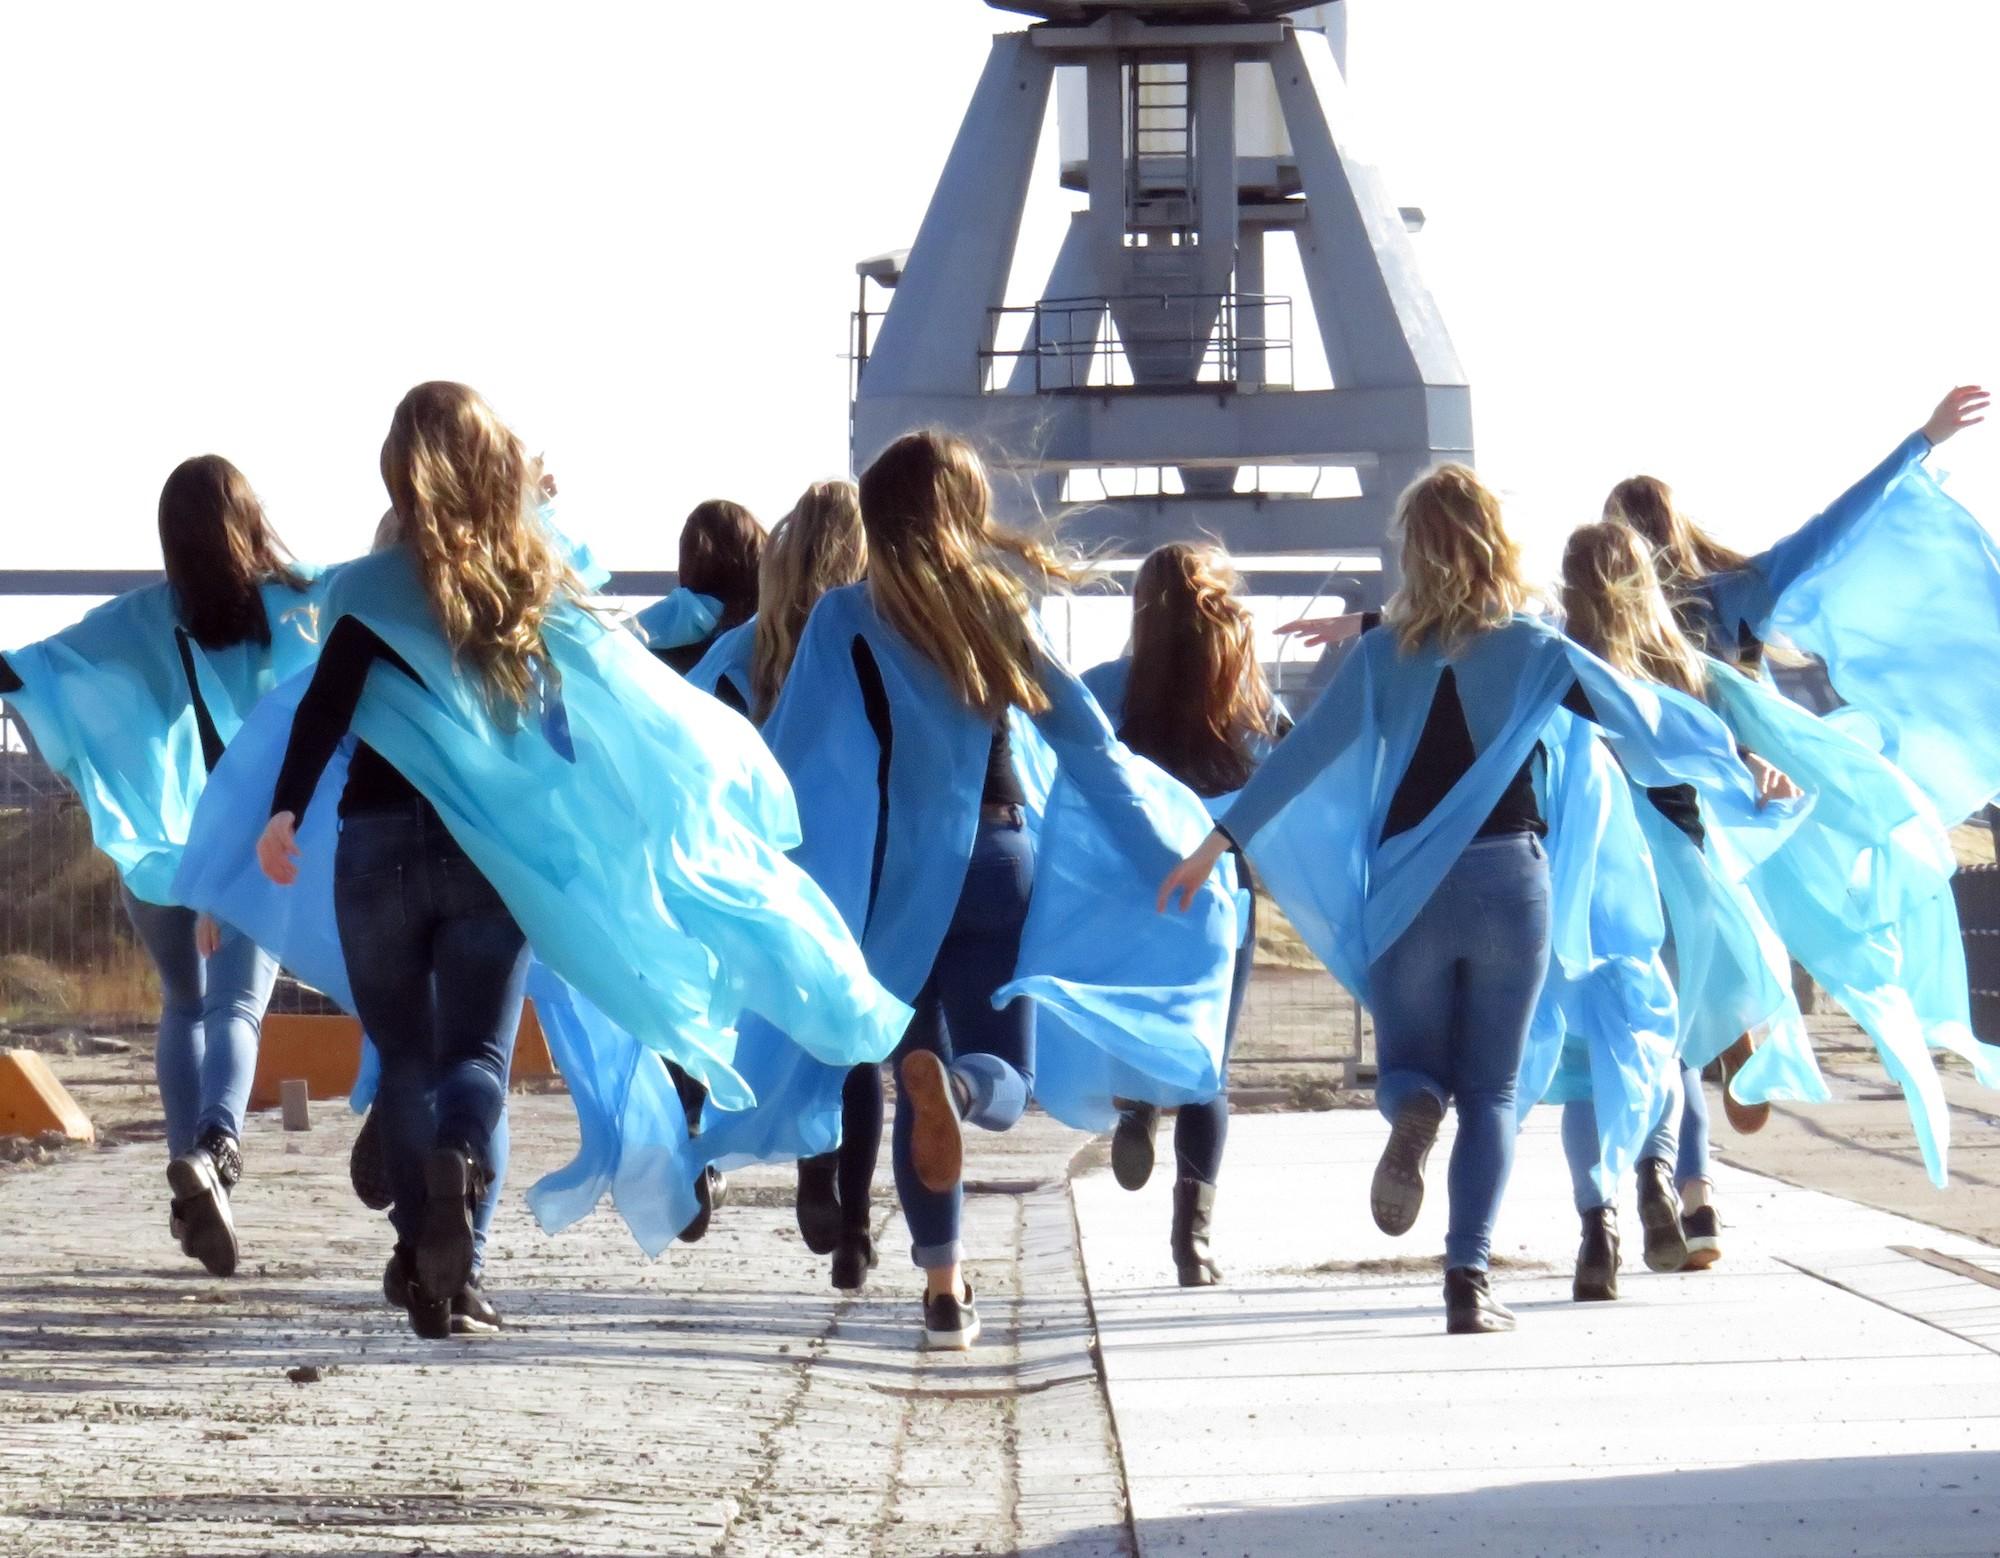 lolaroggeschule-lola-rogge-platz-2018-buggischlolaroggeschule-llola-rogge-platz-2018-buggischIMG_1062-1